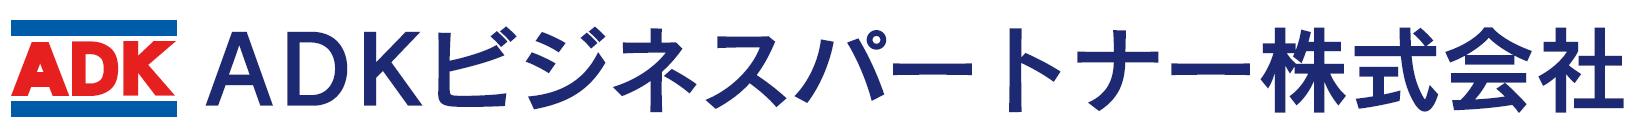 ADKビジネスパートナー株式会社